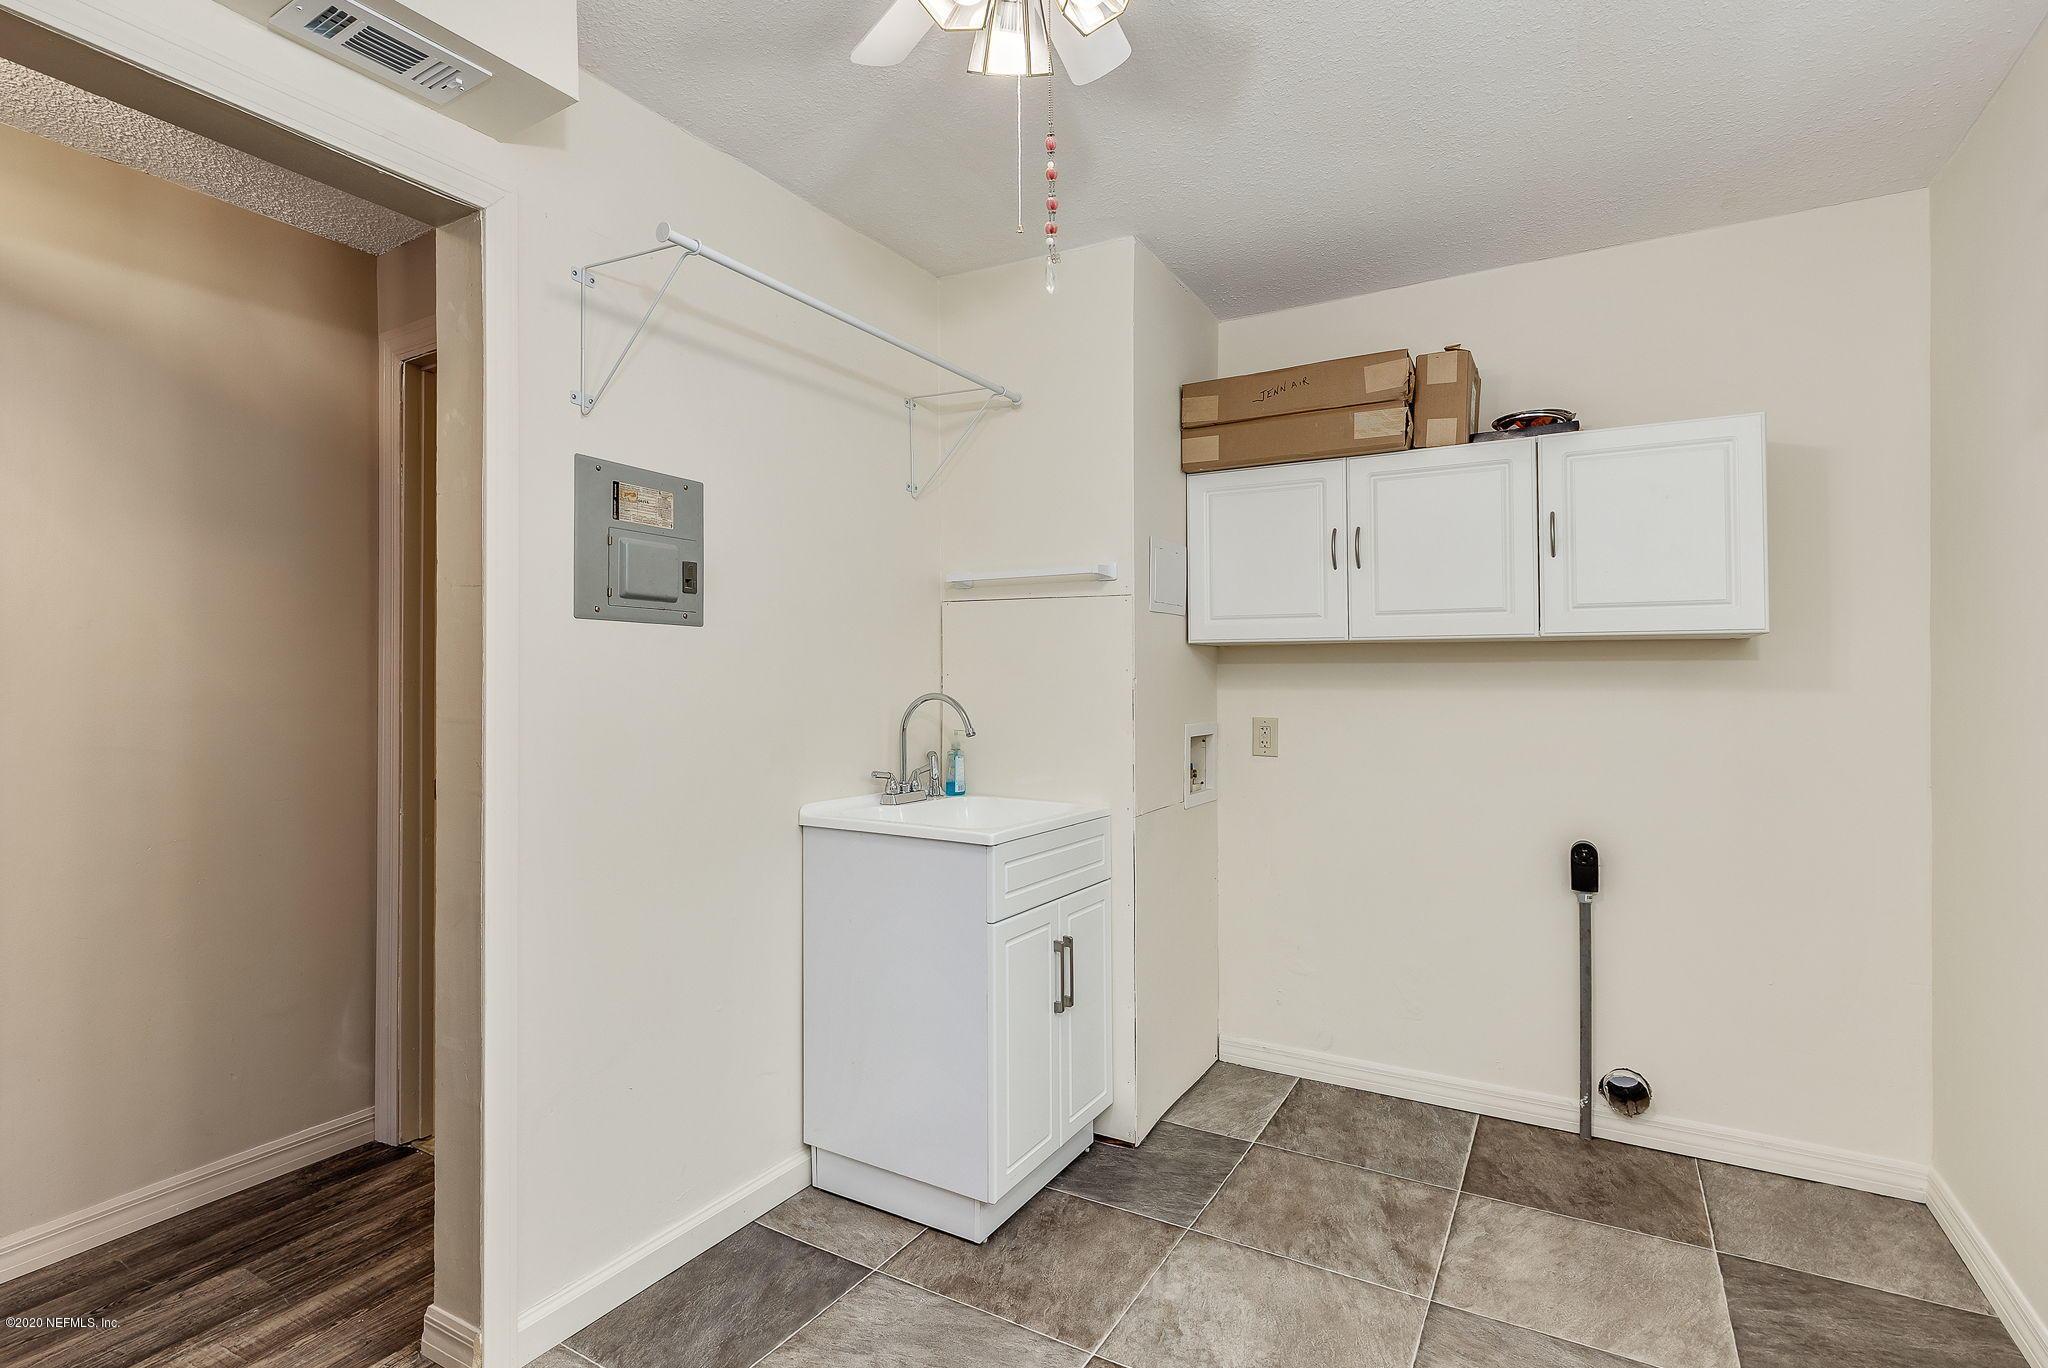 4765 MARA, JACKSONVILLE, FLORIDA 32258, 4 Bedrooms Bedrooms, ,2 BathroomsBathrooms,Residential,For sale,MARA,1074058